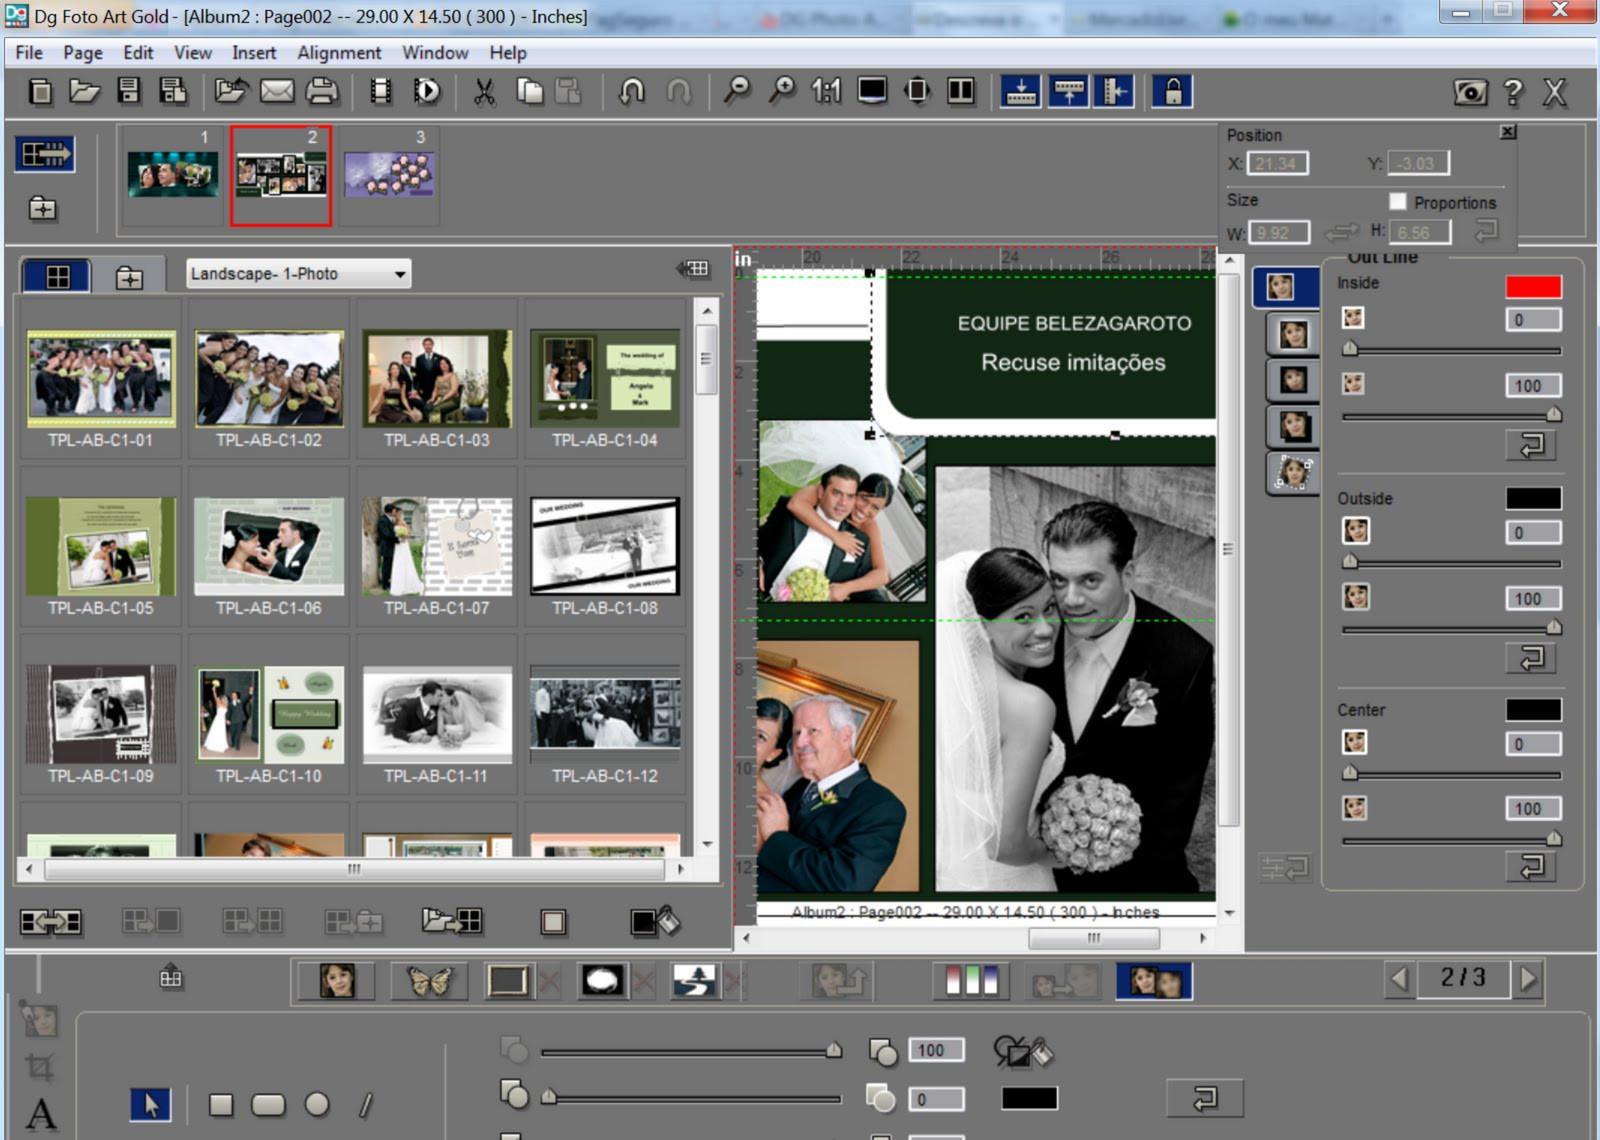 Ausmalbilder Fußball Wappen Neu Salvar Fotos Dg Foto Art Trial Galerie